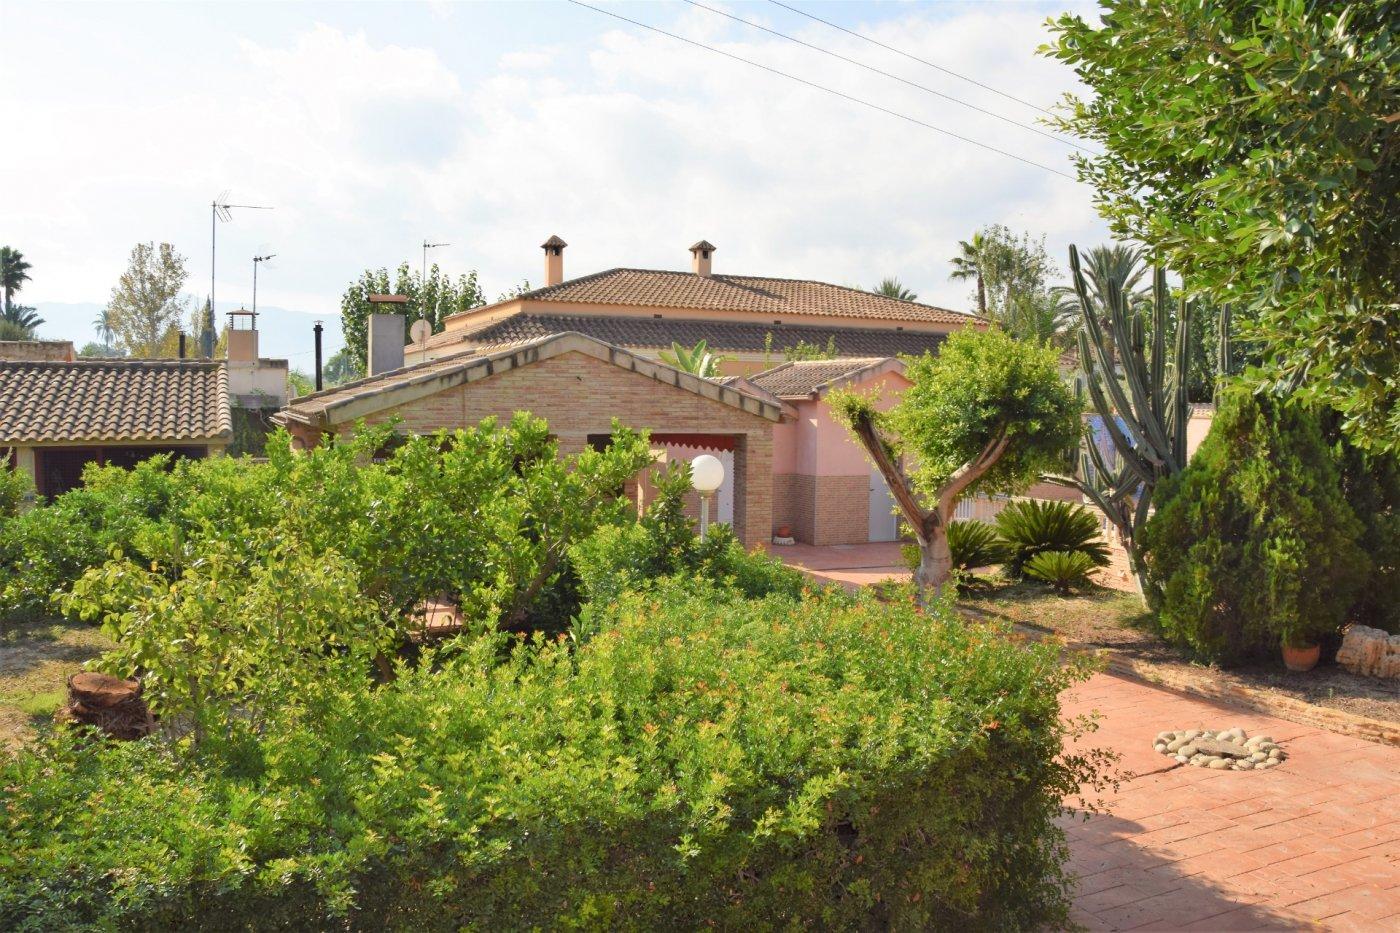 Chalet en Murcia www.joaquincarceles.com JC174 (50)